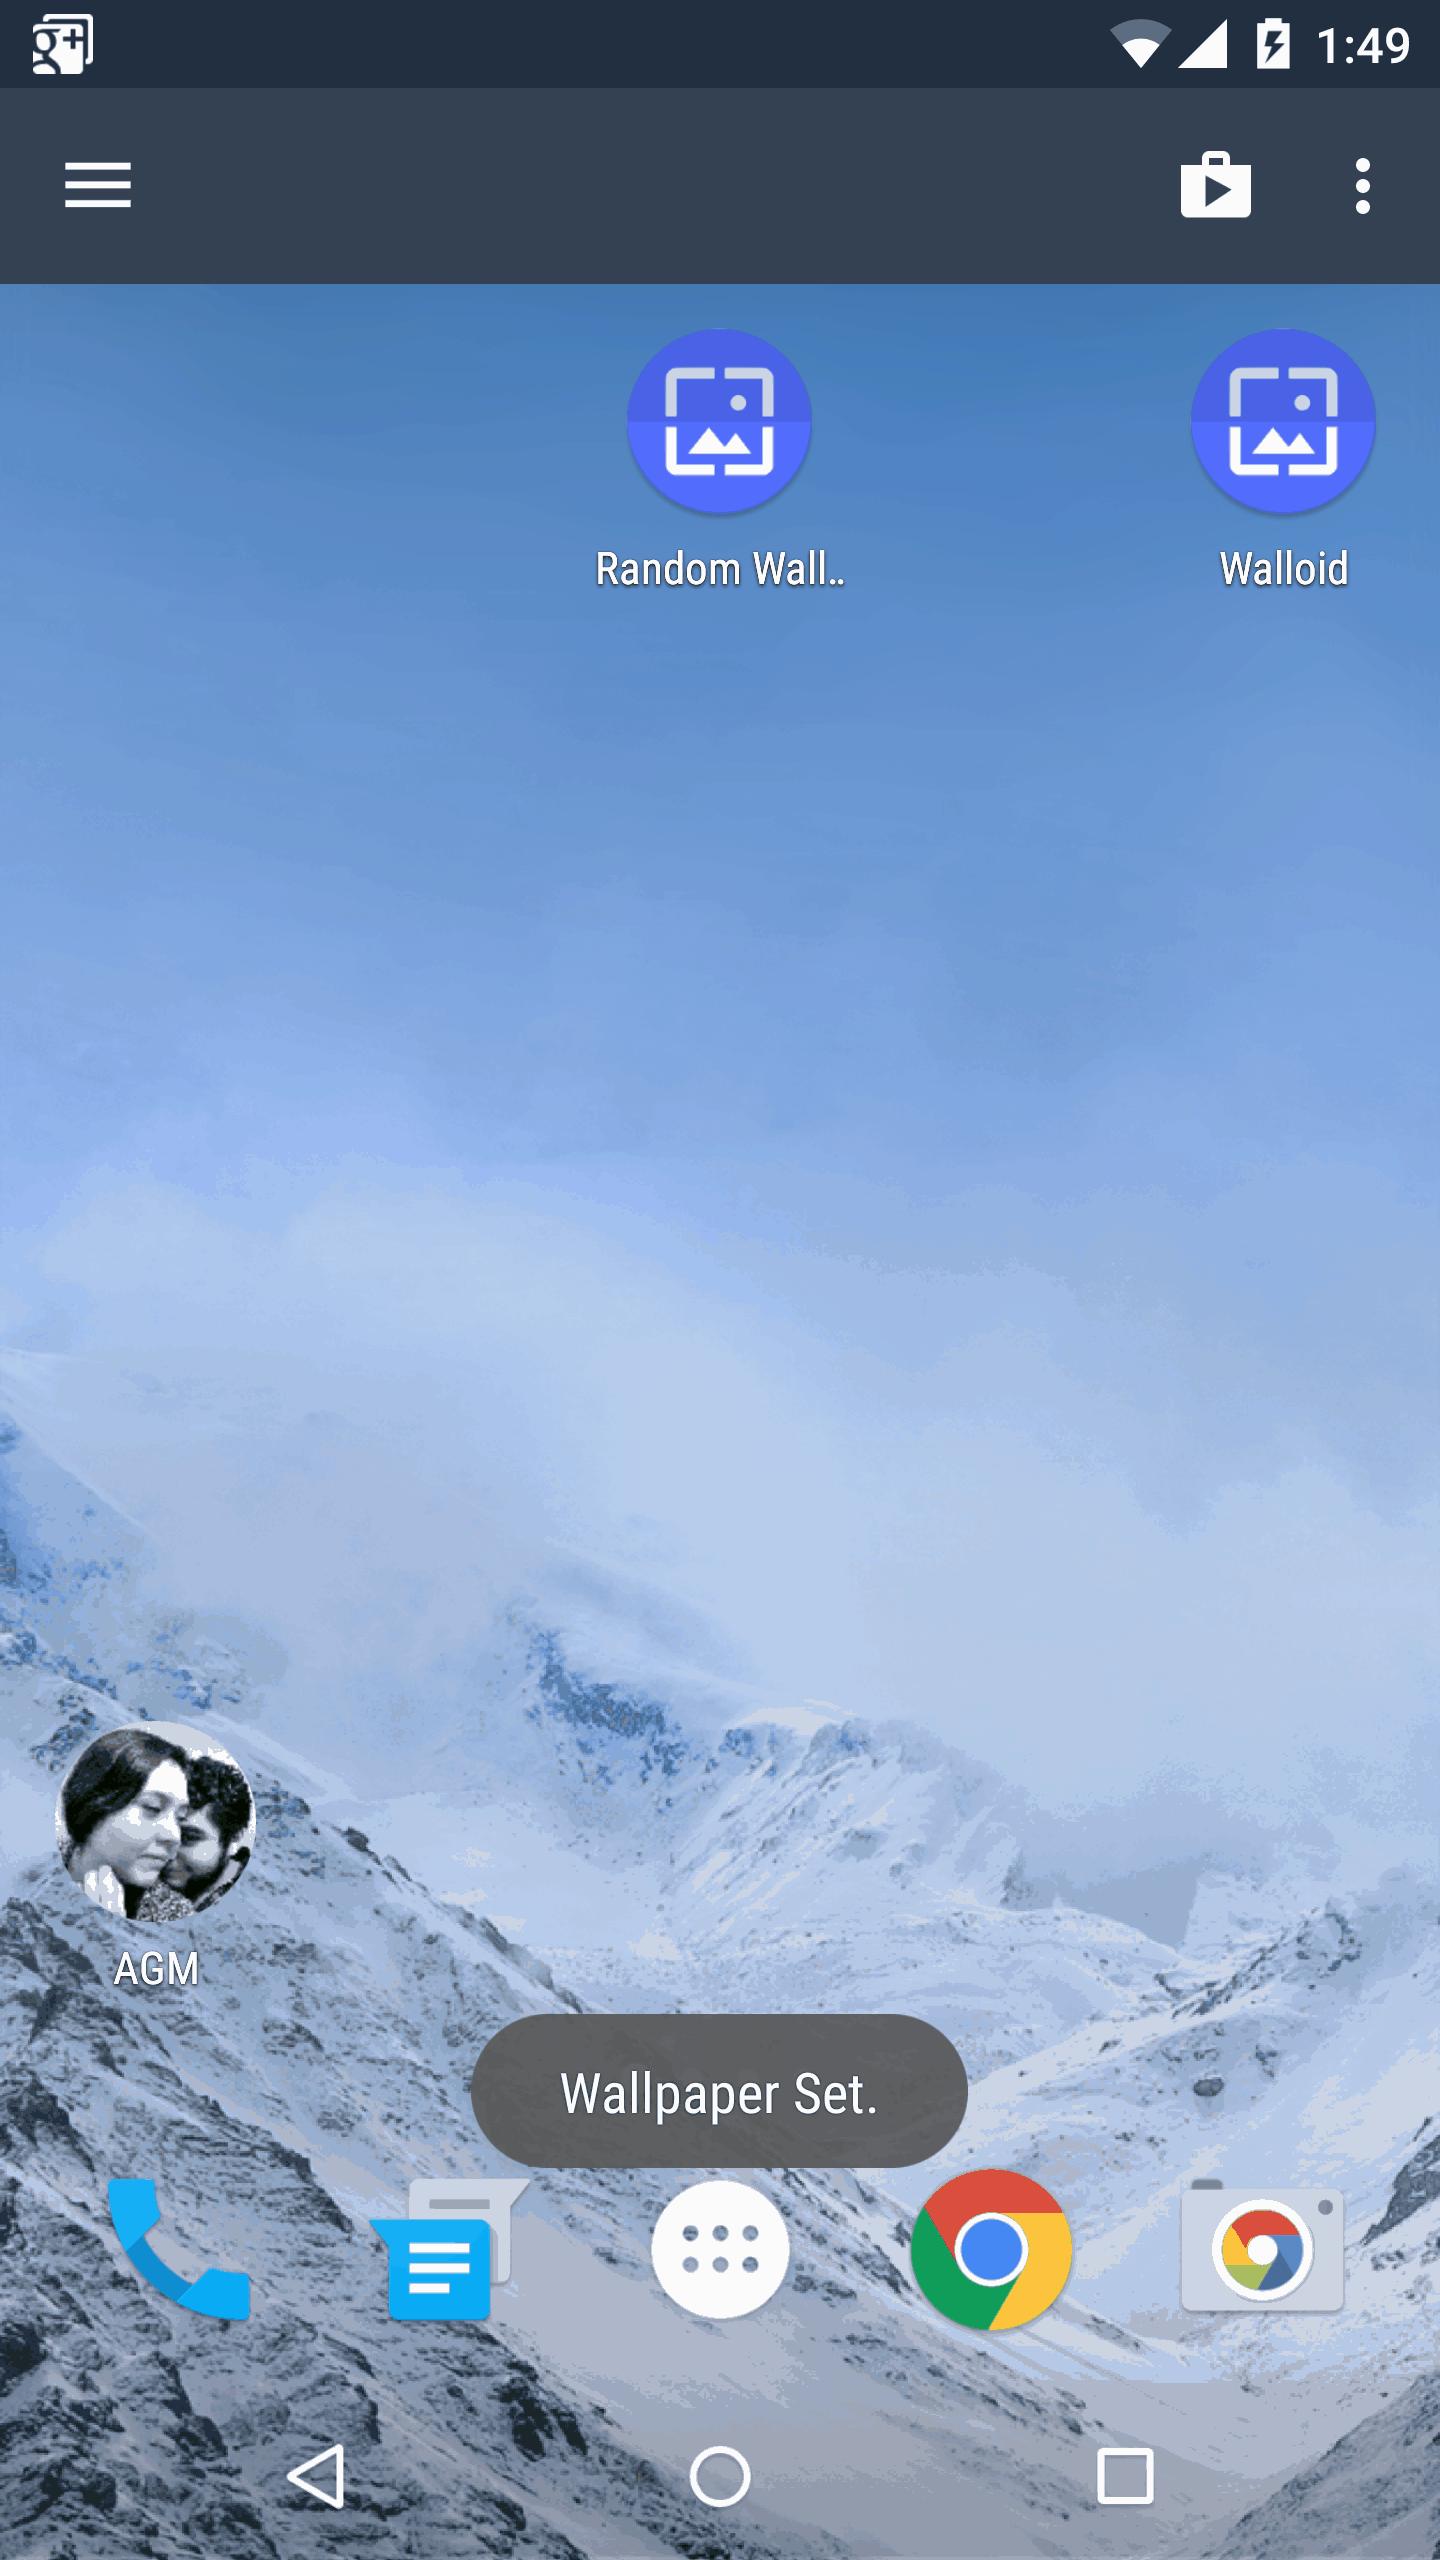 Screenshot_2015-04-26-13-49-57